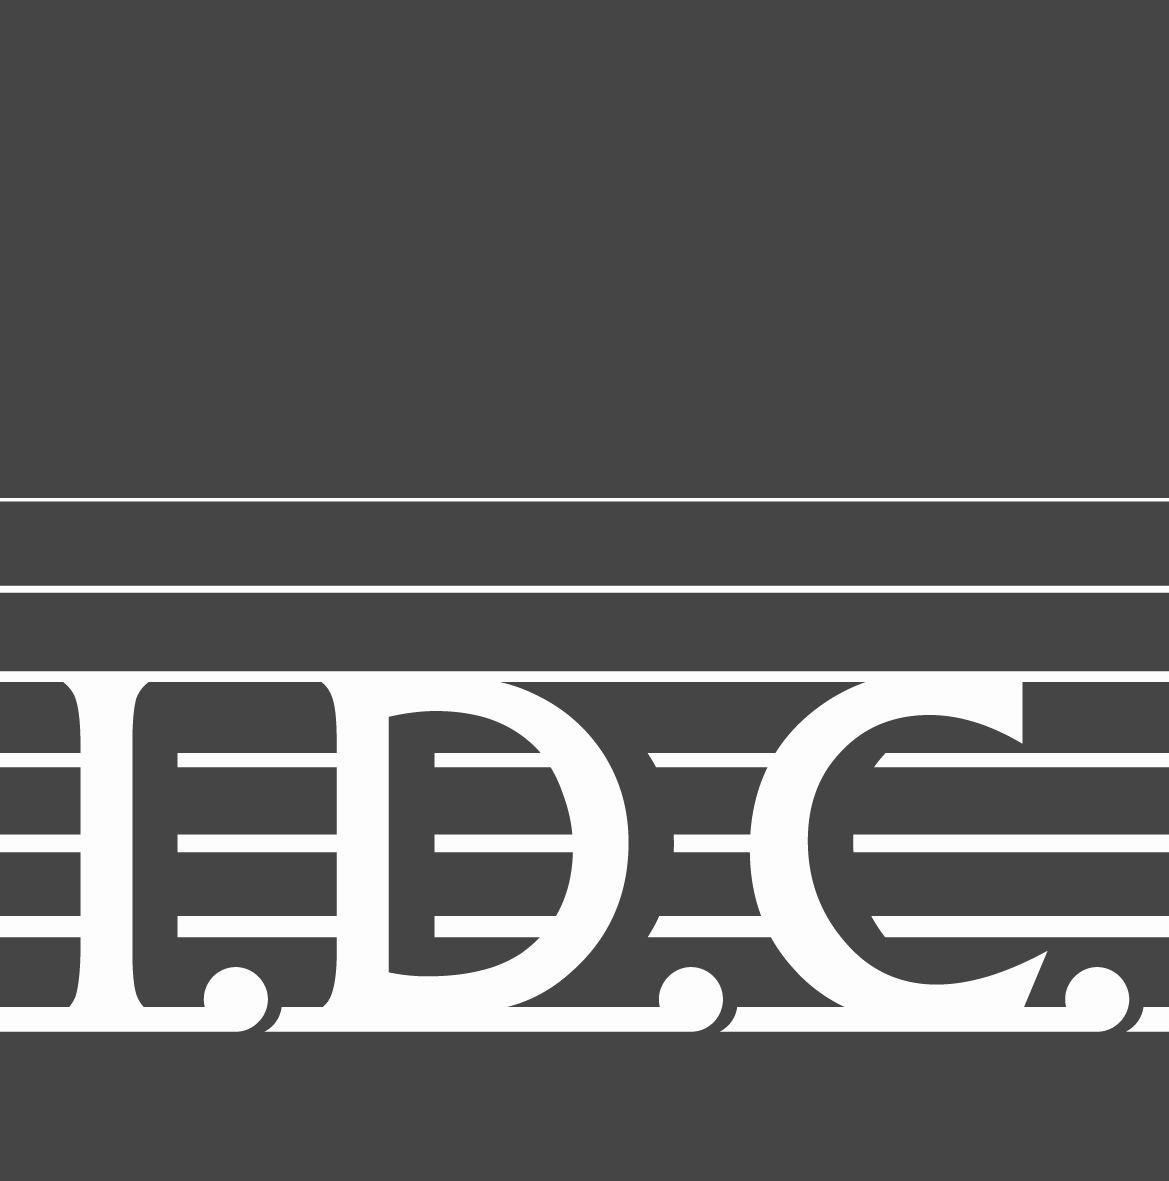 IDC Hungária Zrt., I.D.C Hungária Zrt.